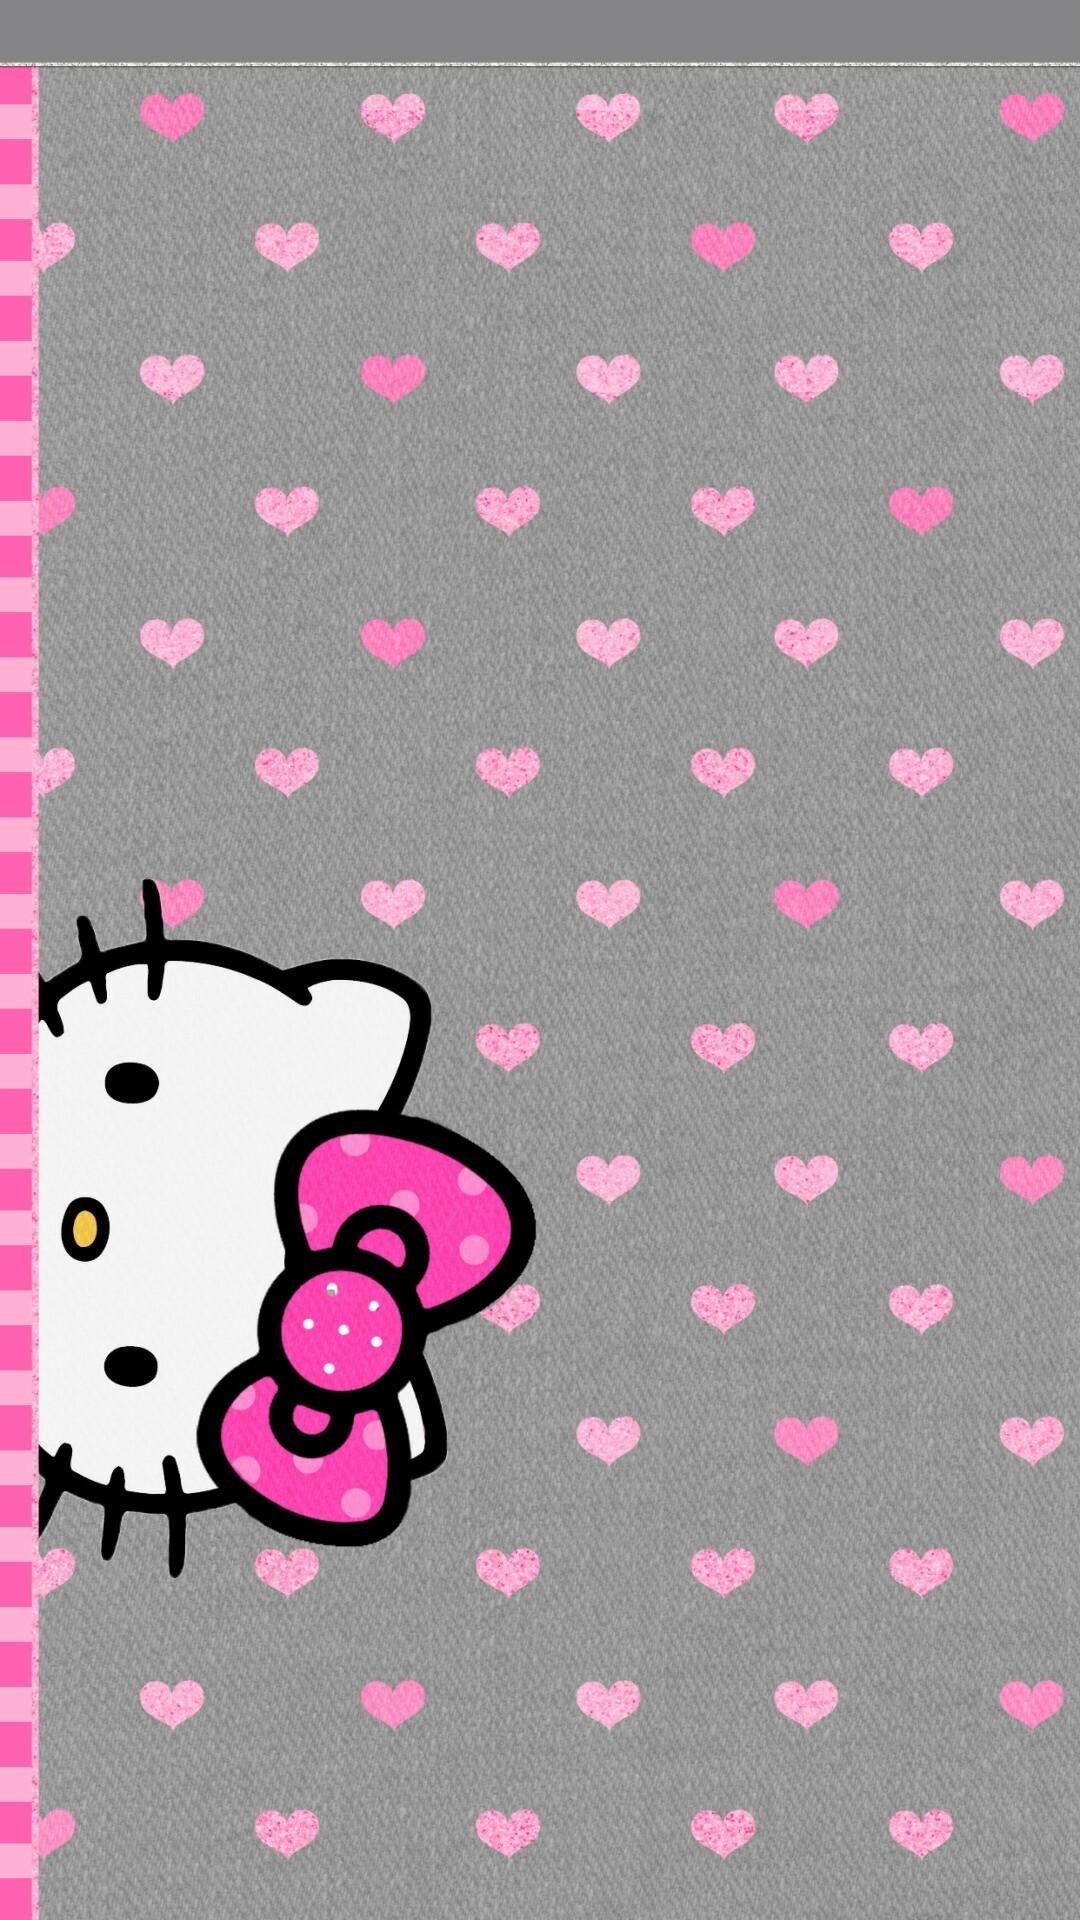 Popular Wallpaper Hello Kitty Dark Pink - 849450-hello-kitty-black-backgrounds-1080x1920-laptop  Picture_619510.jpg